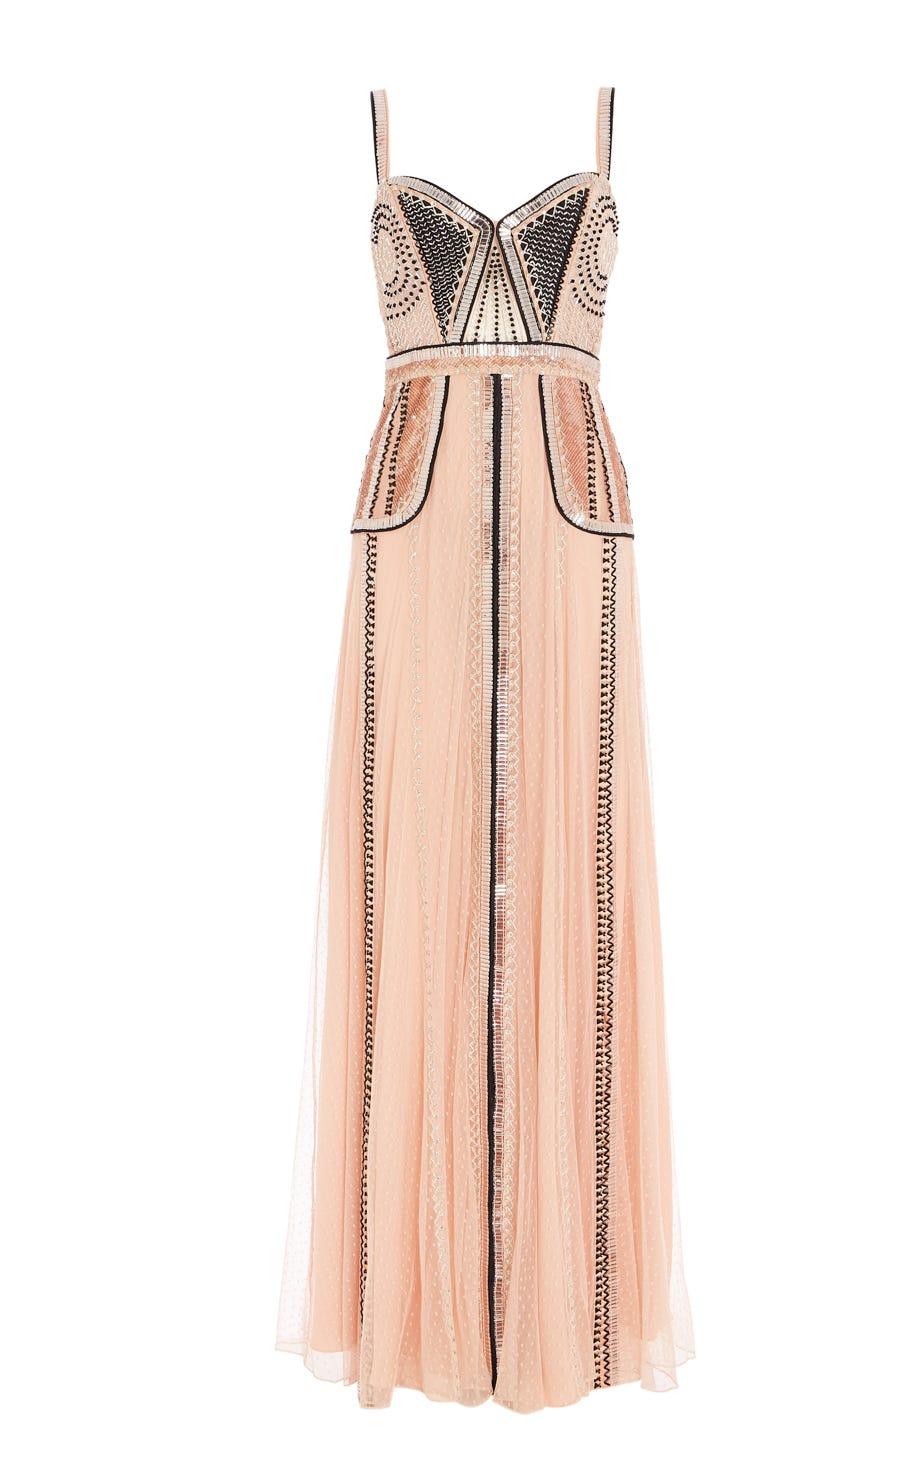 Electra Strappy Dress